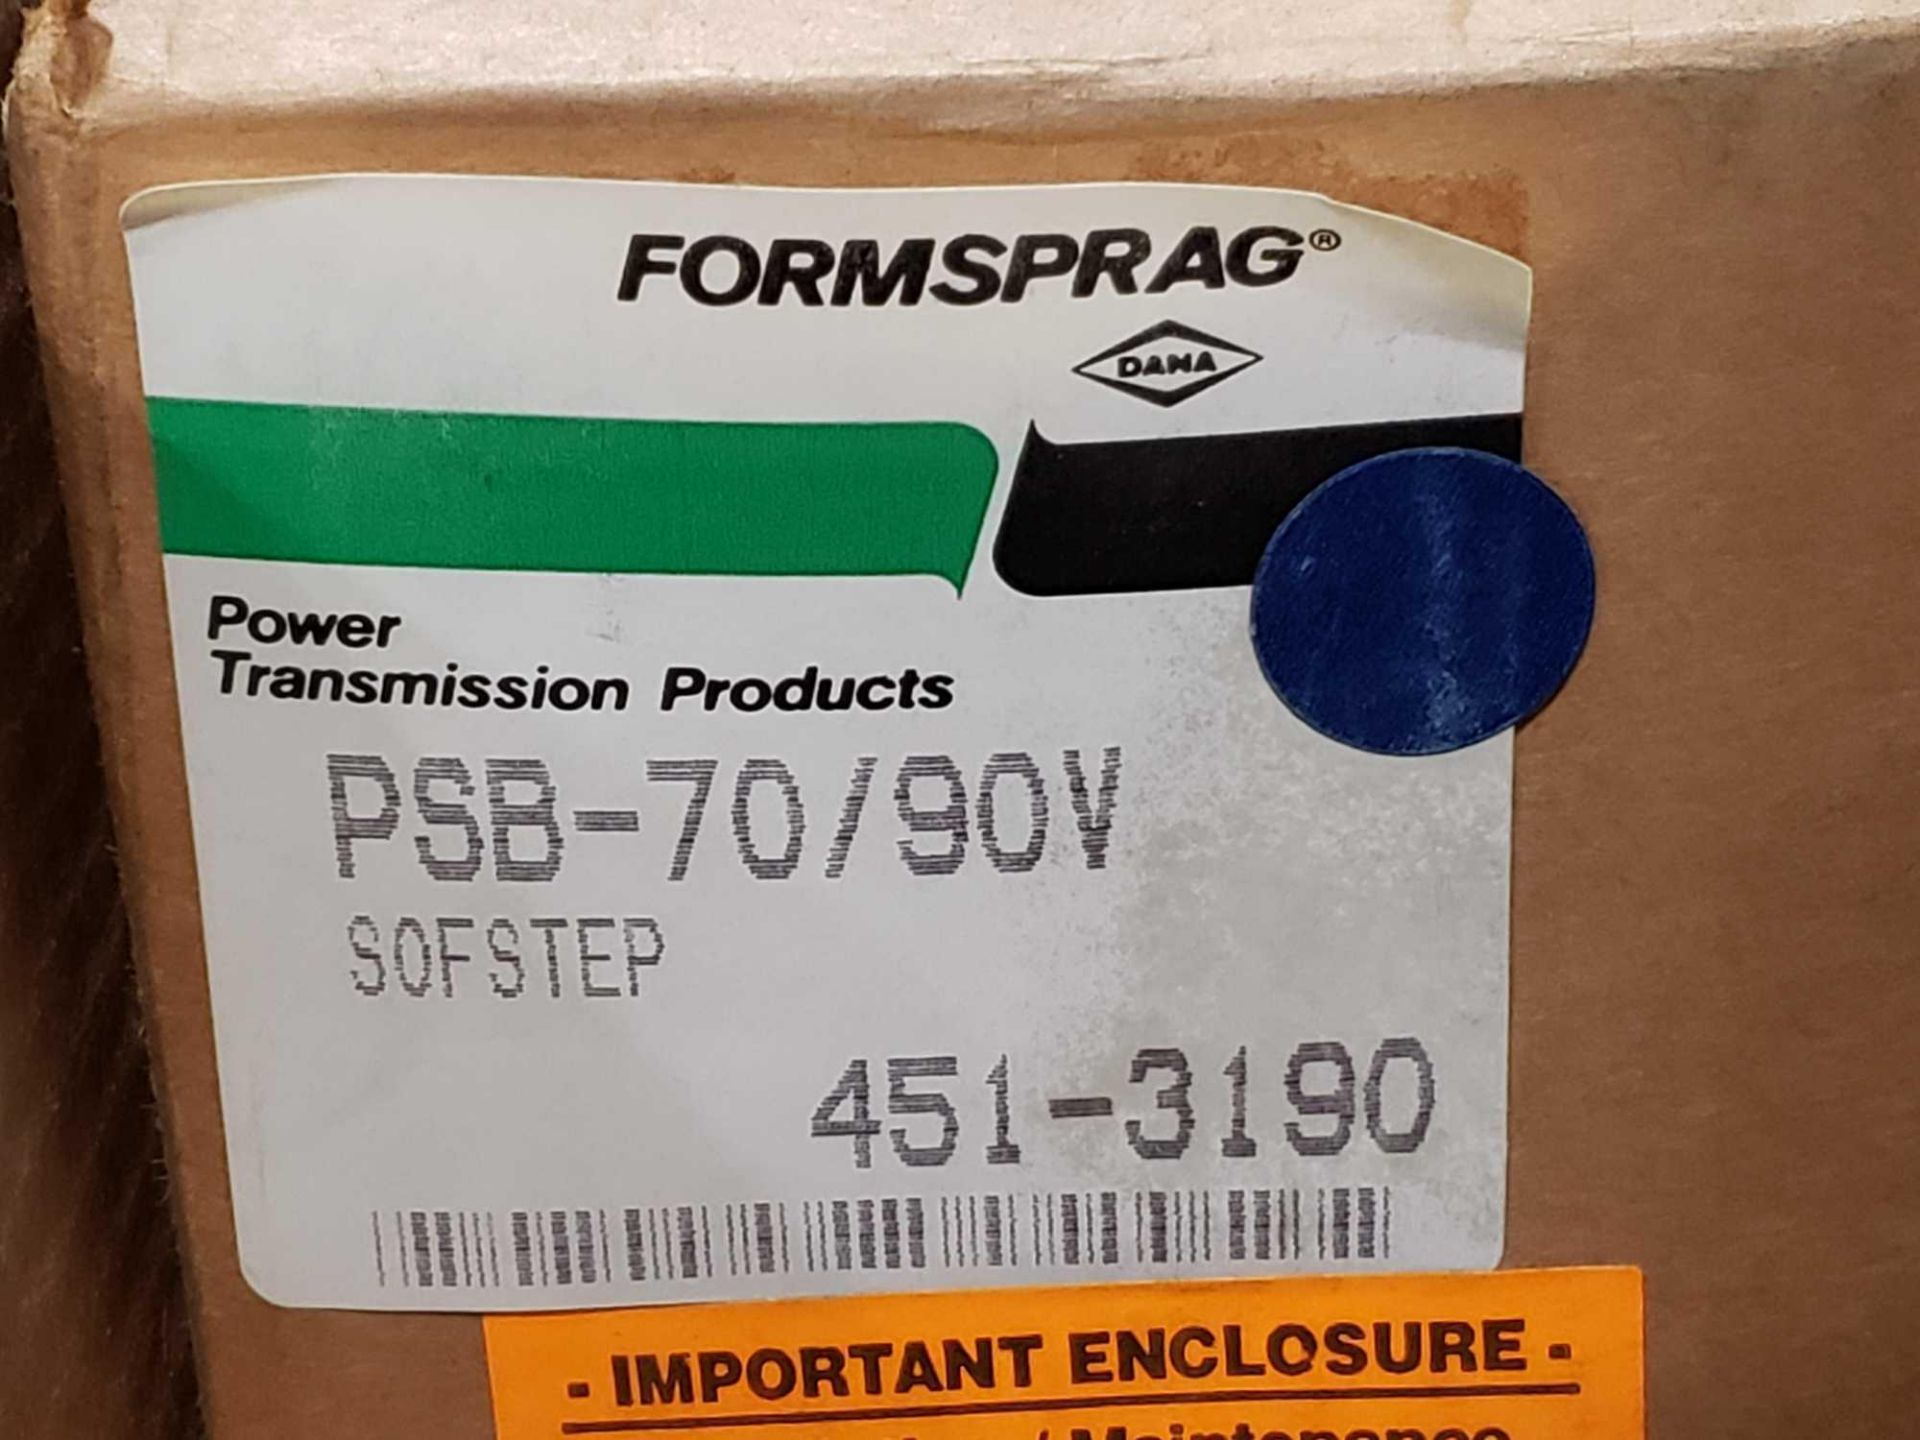 Lot 1 - Formsprag Magpowr sofstep model PSB-70/90V magnetic partical clutch brake. New in box.